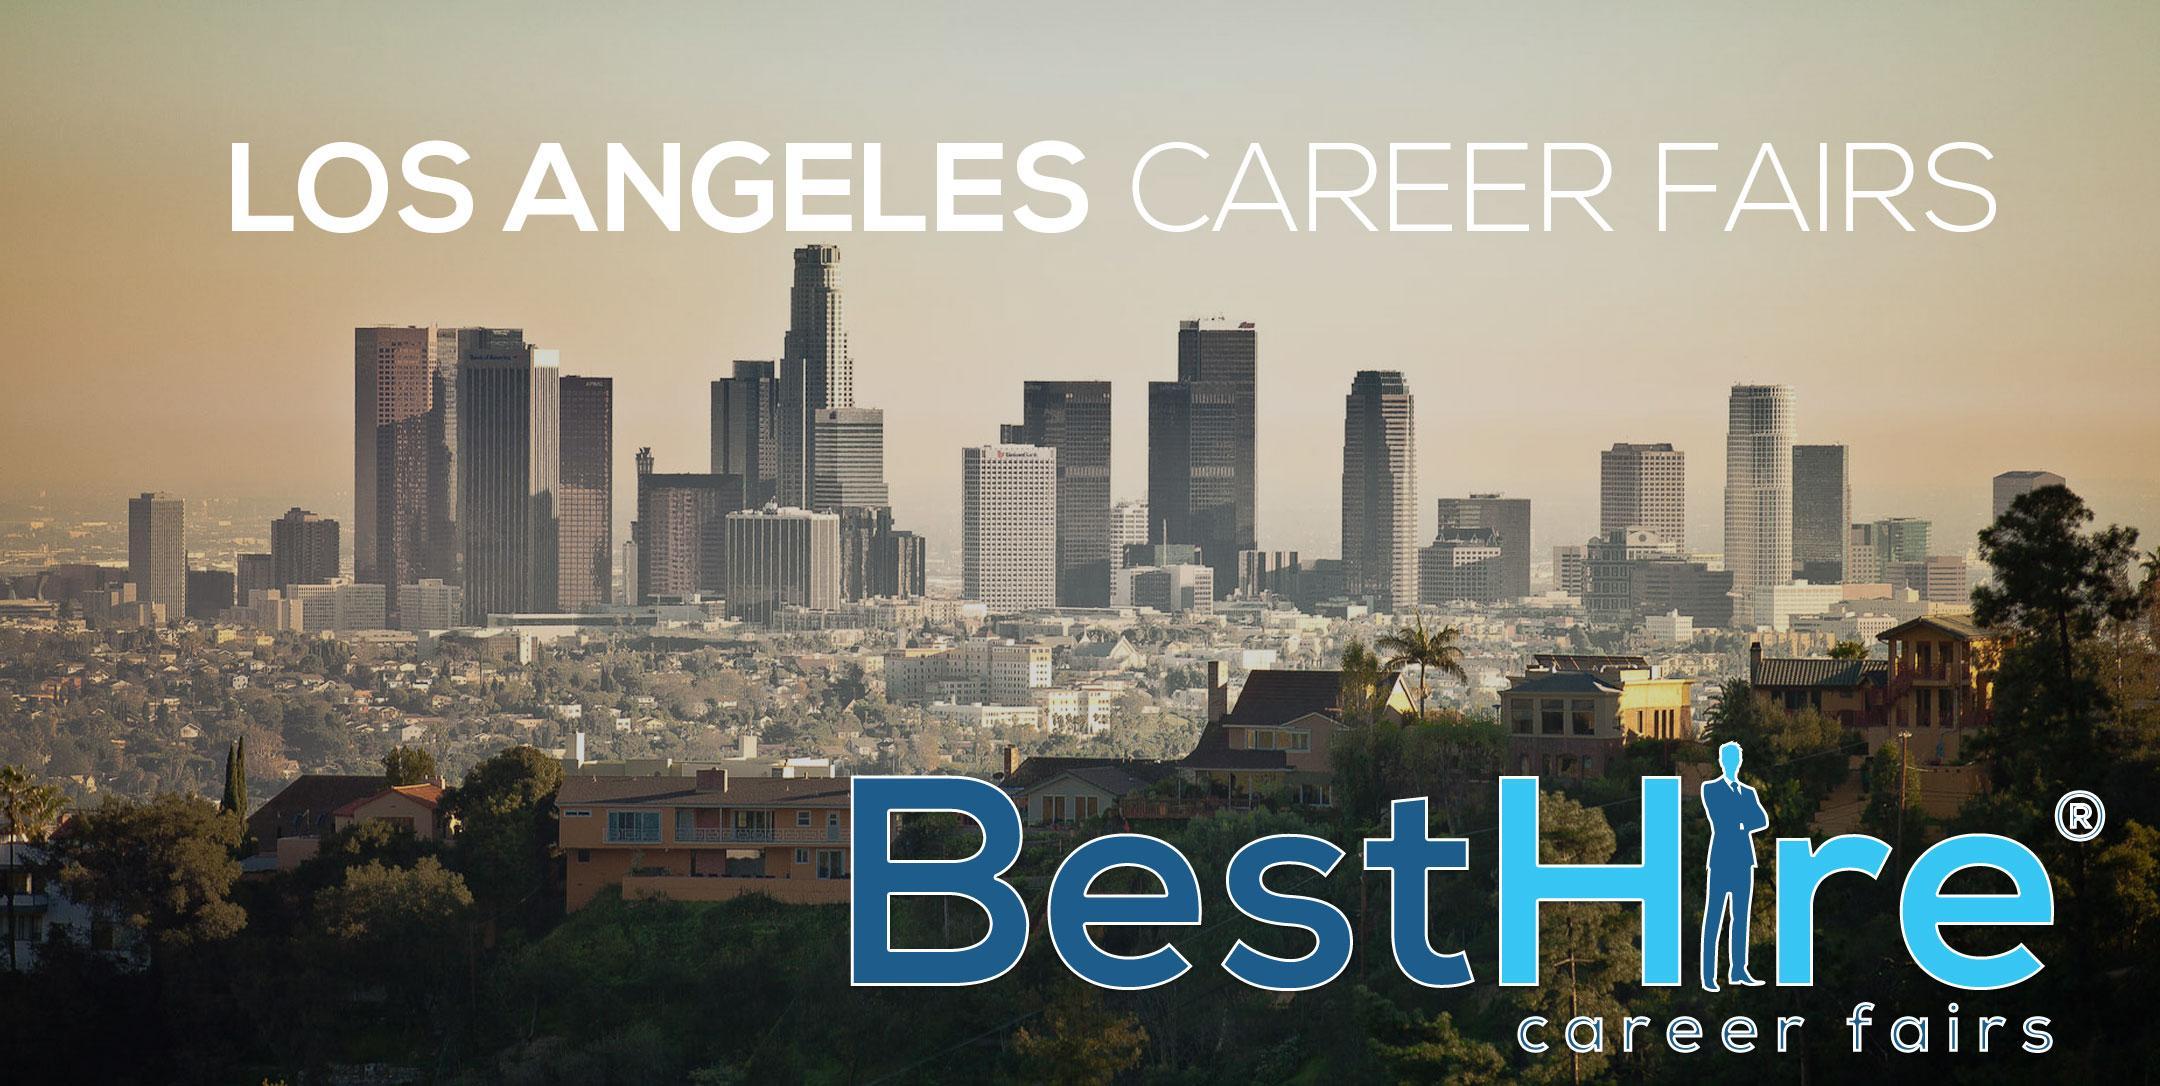 Los Angeles Career Fair - October 05, 2017 Job Fairs & Hiring Events in Los Angeles CA